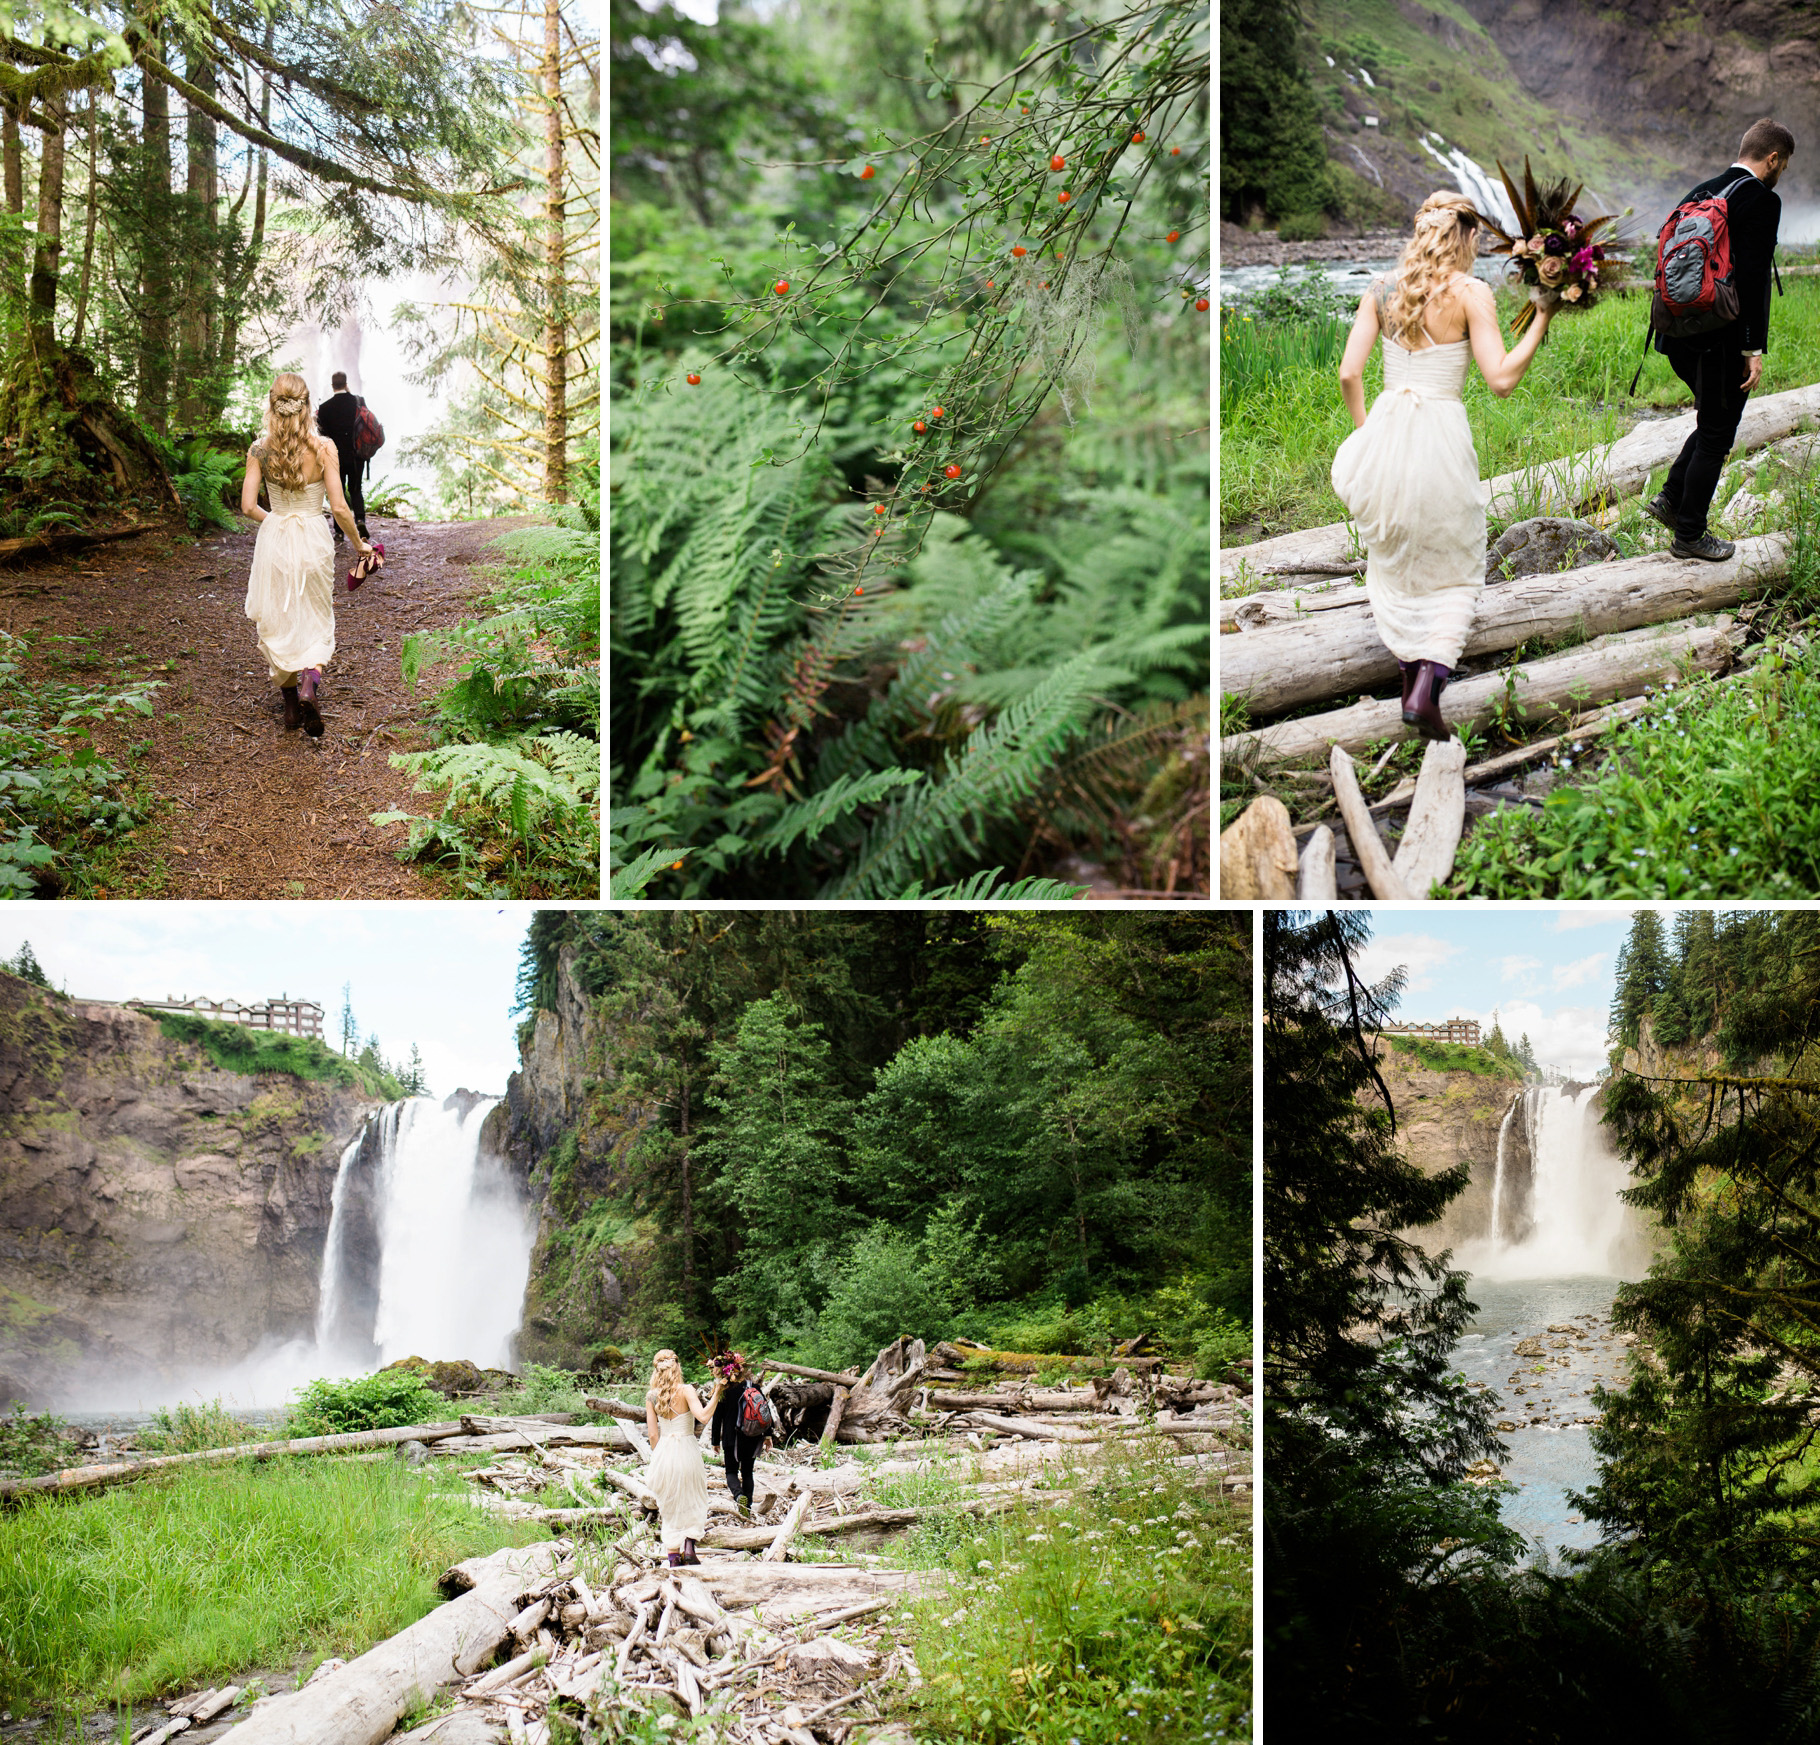 16-Adventure-Elopement-Waterfall-Seattle-Wedding-Photographer-Snoqualmie-Falls-Hike